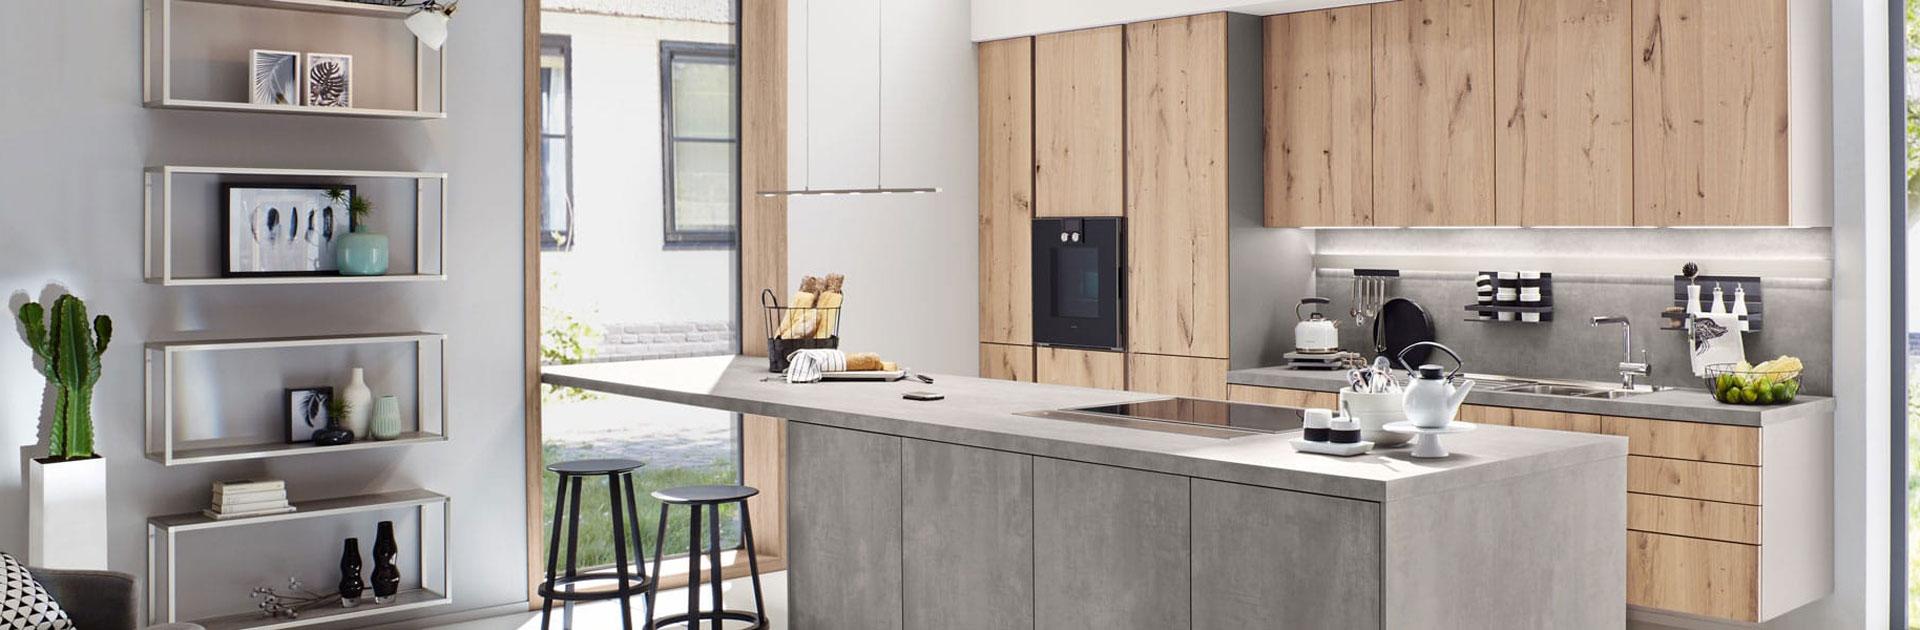 Betonlook keuken en houten keukenkasten | Eigenhuis Keukens